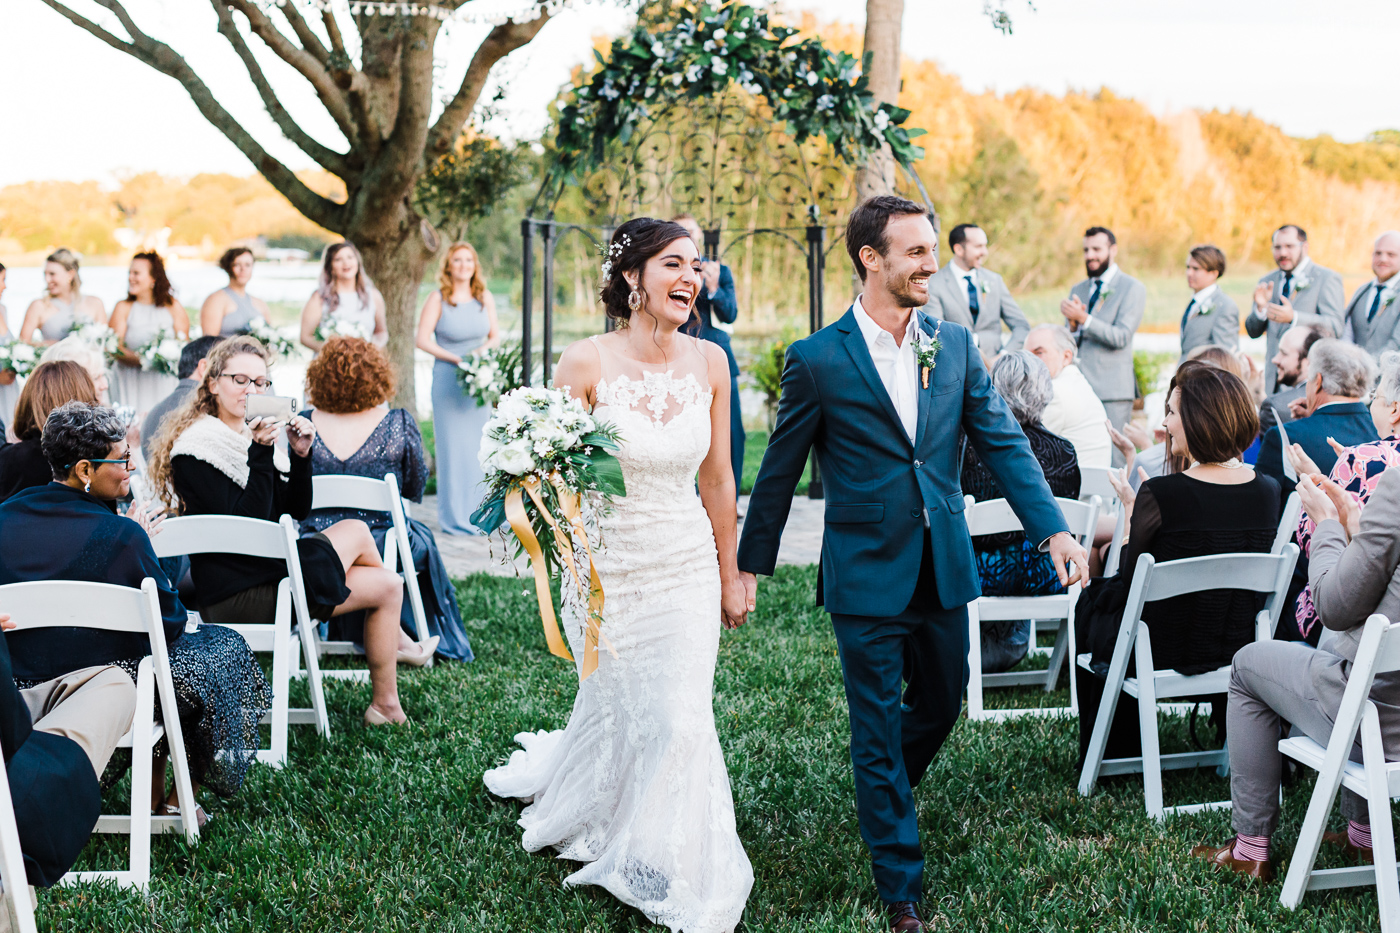 Bride-and-groom-walking-down-the-isle